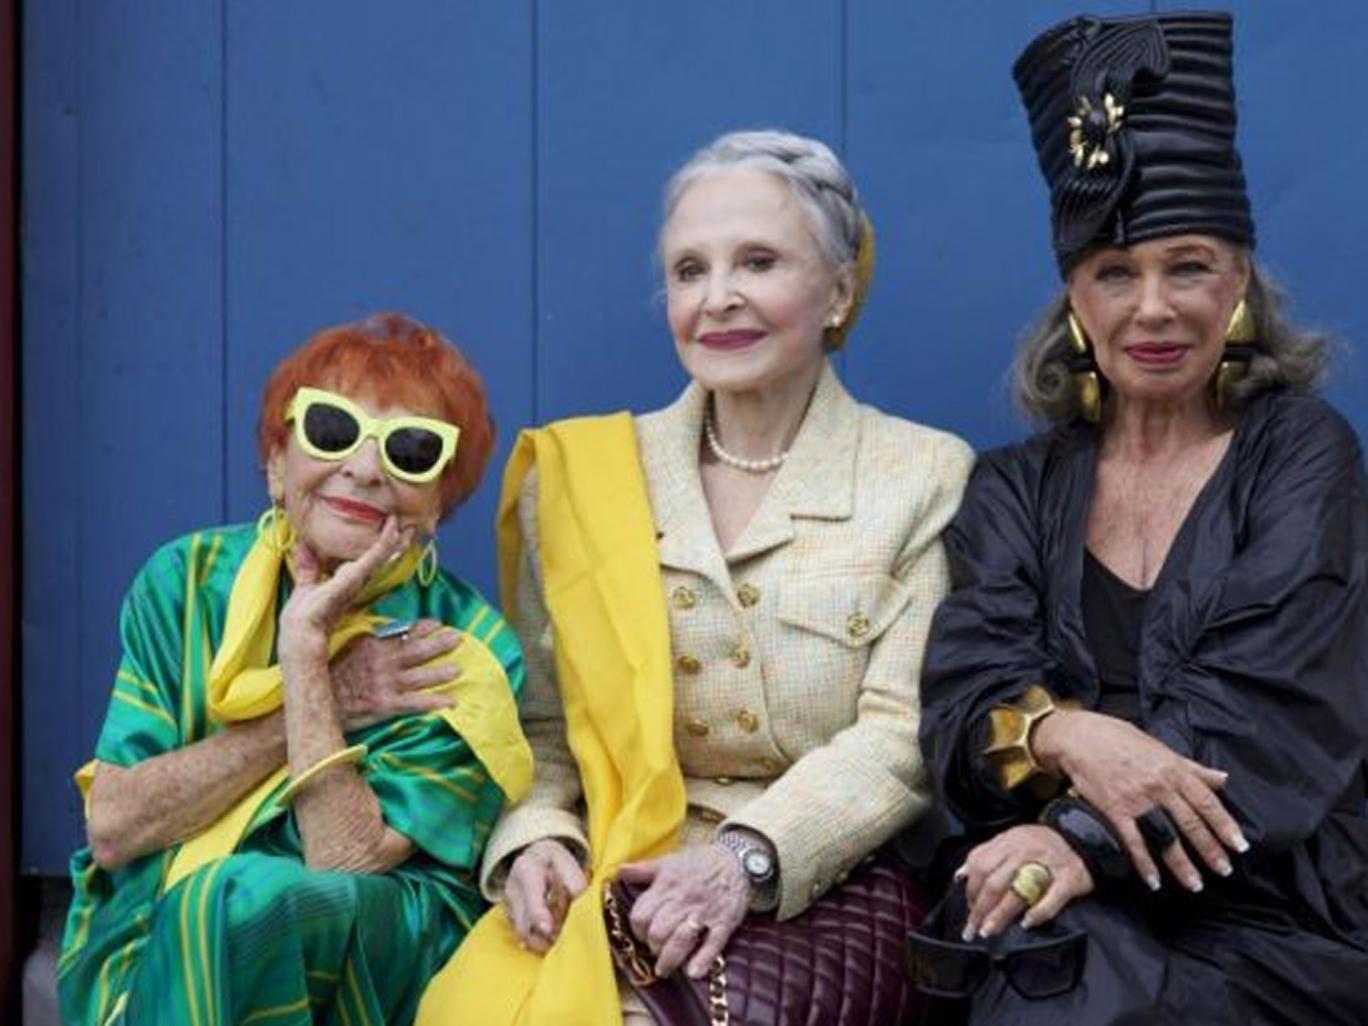 Golden girls: the stars of 'Advanced Style'